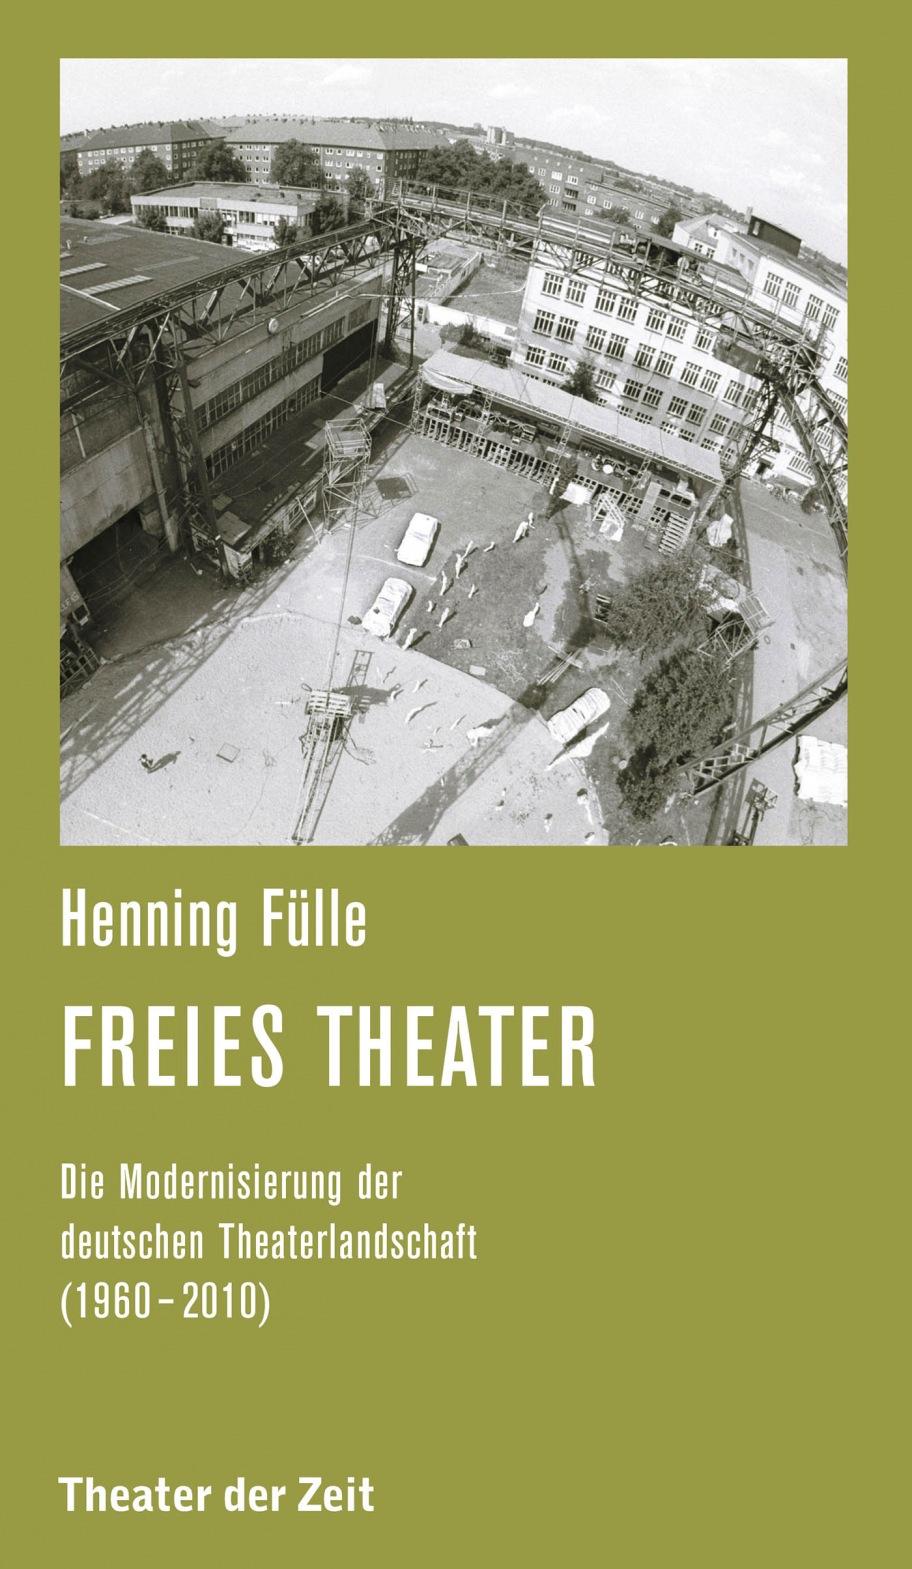 Henning Fülle: Freies Theater